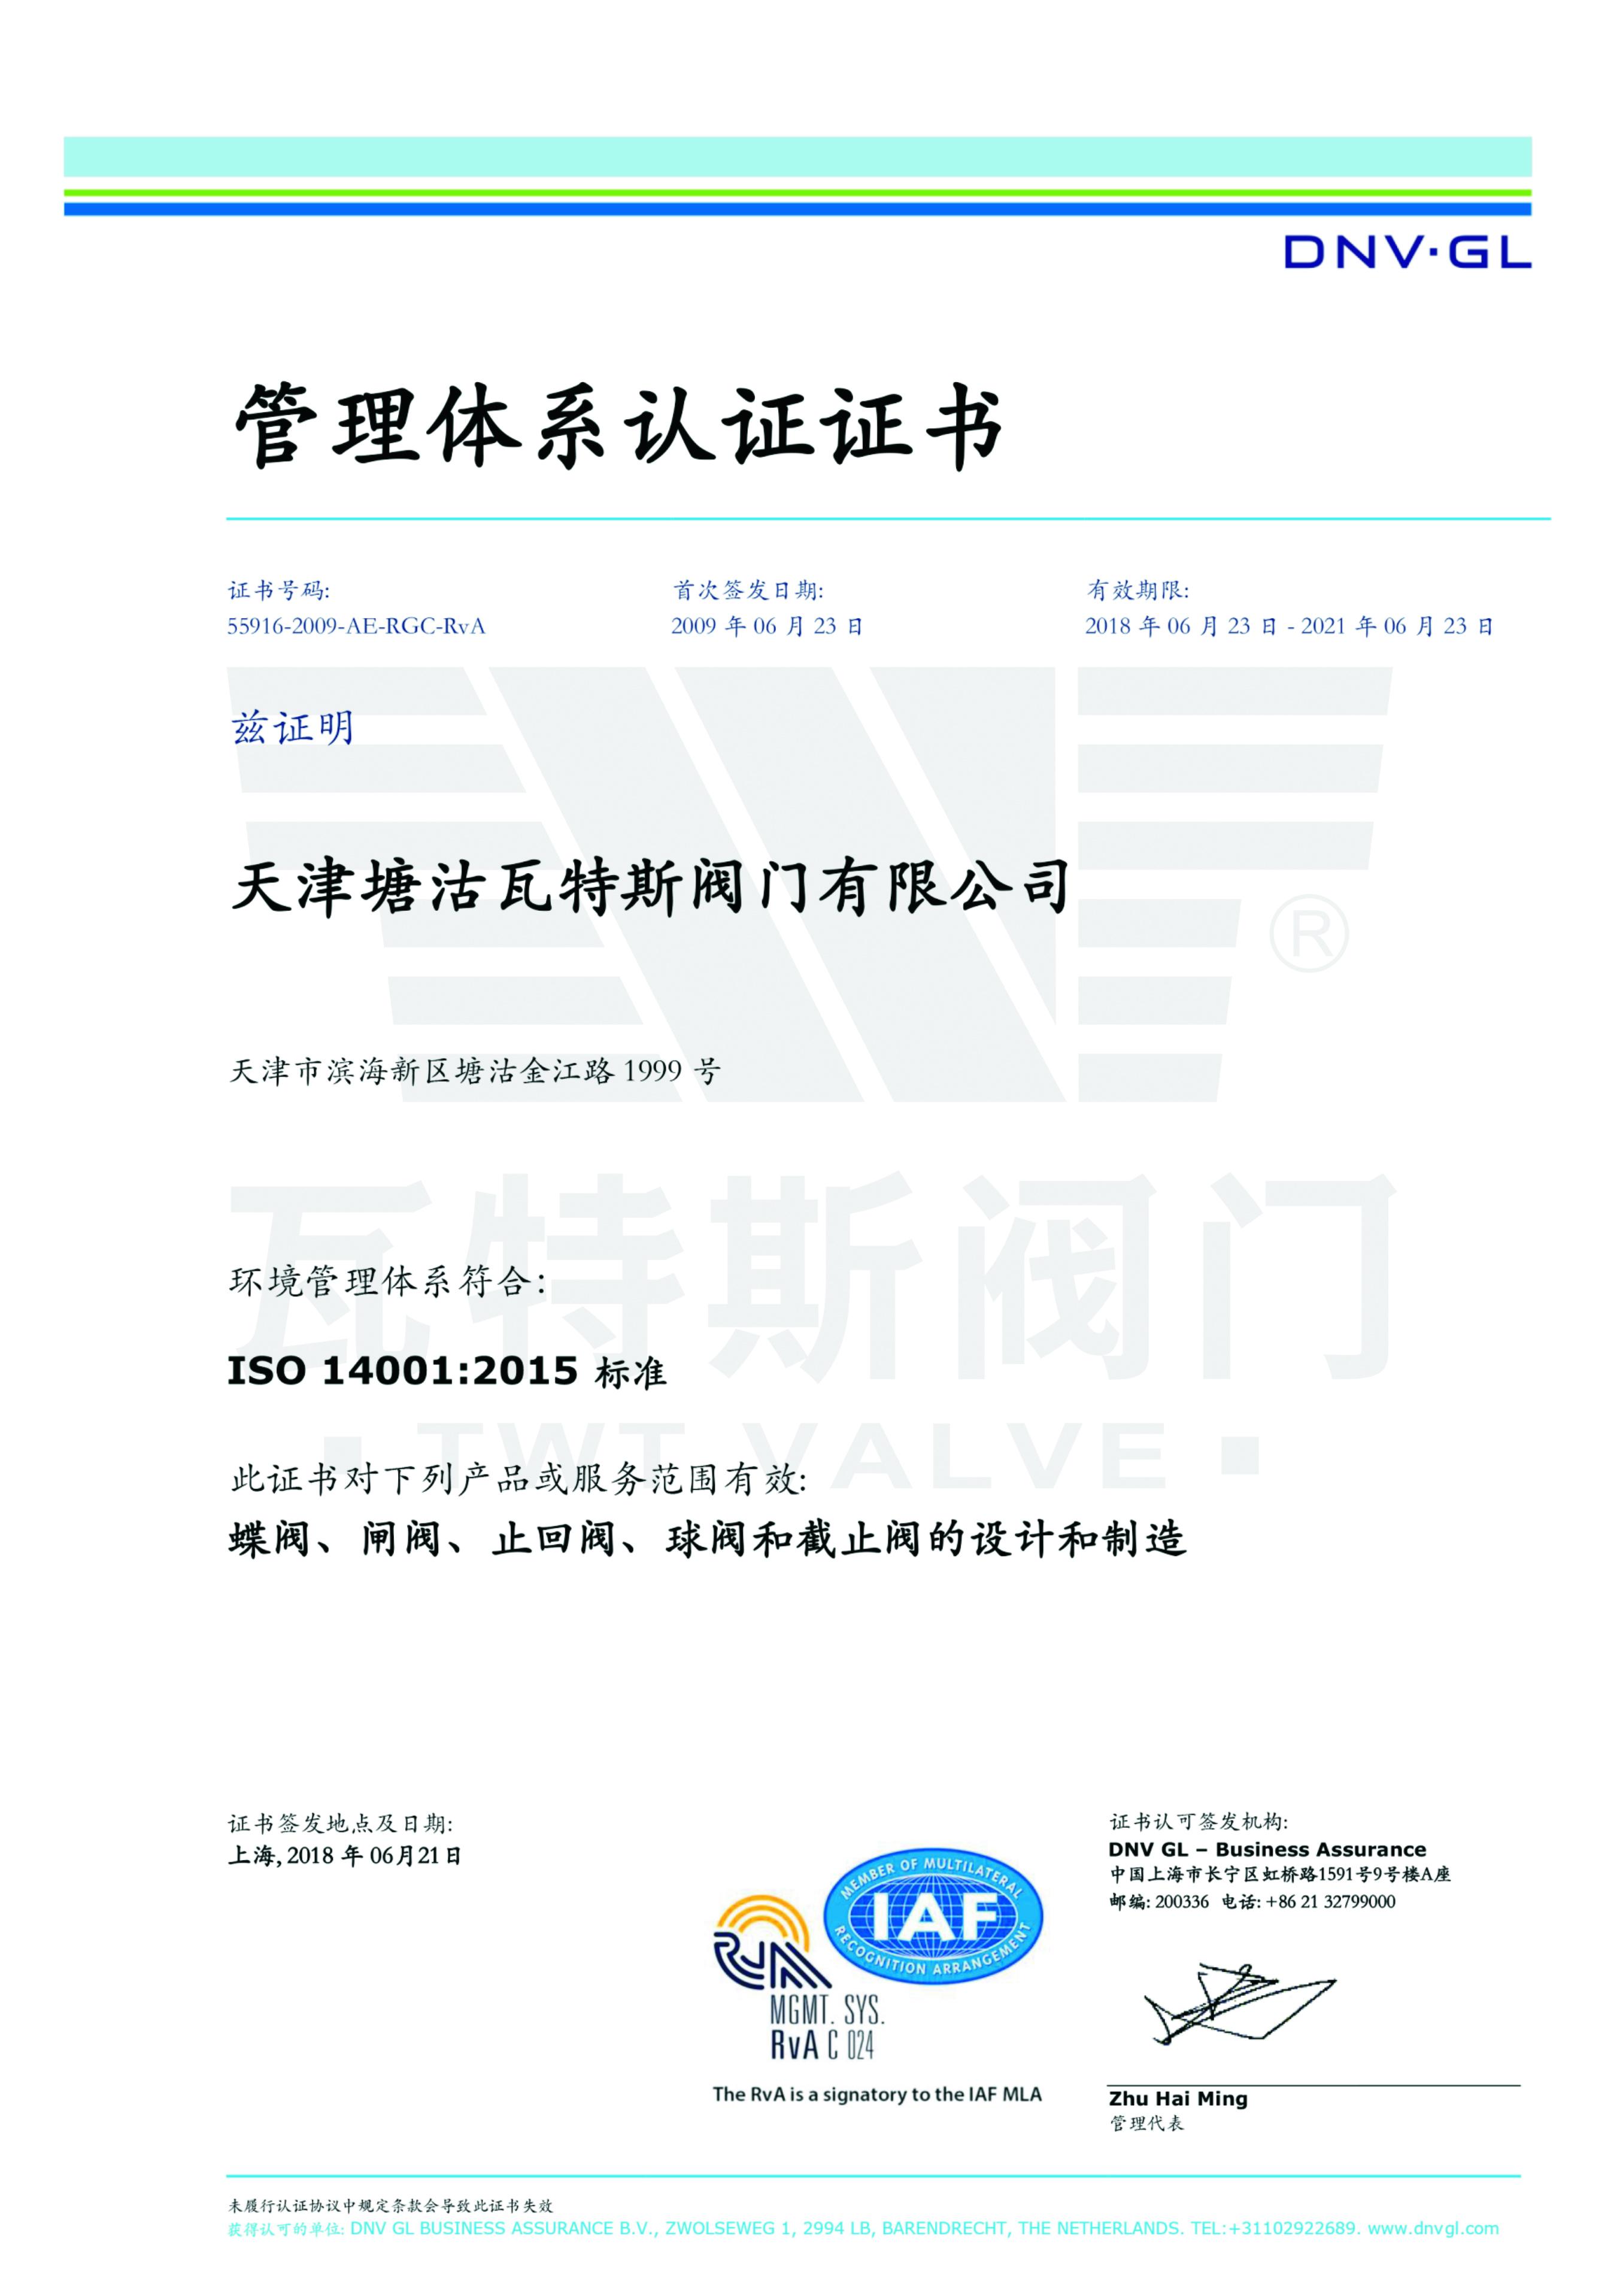 ISO14001:2015环境体系认证中文